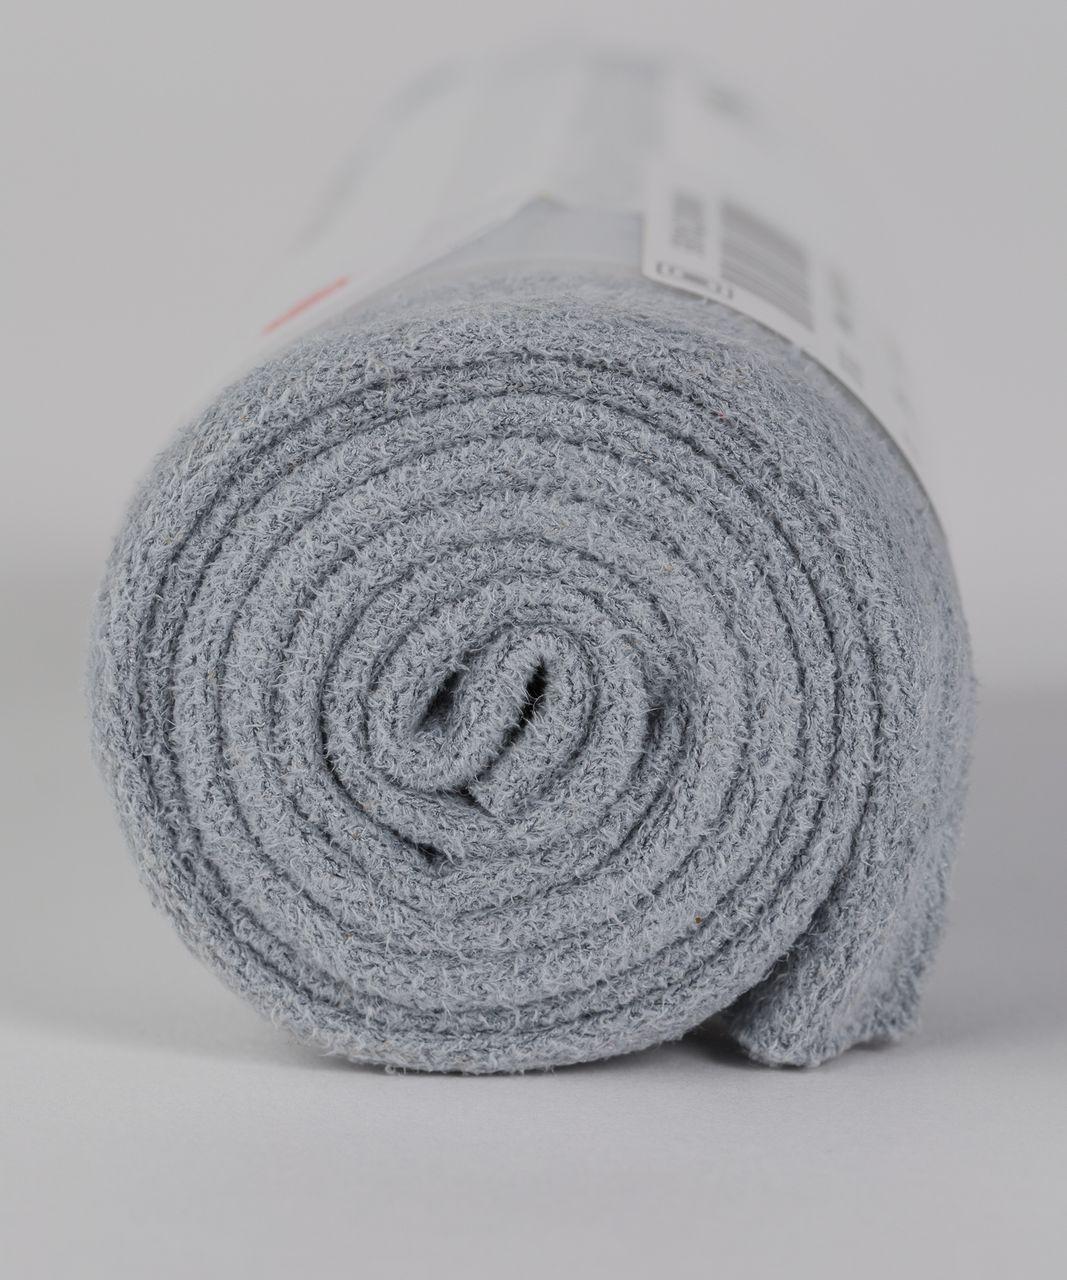 Lululemon The (Small) Towel - Hail